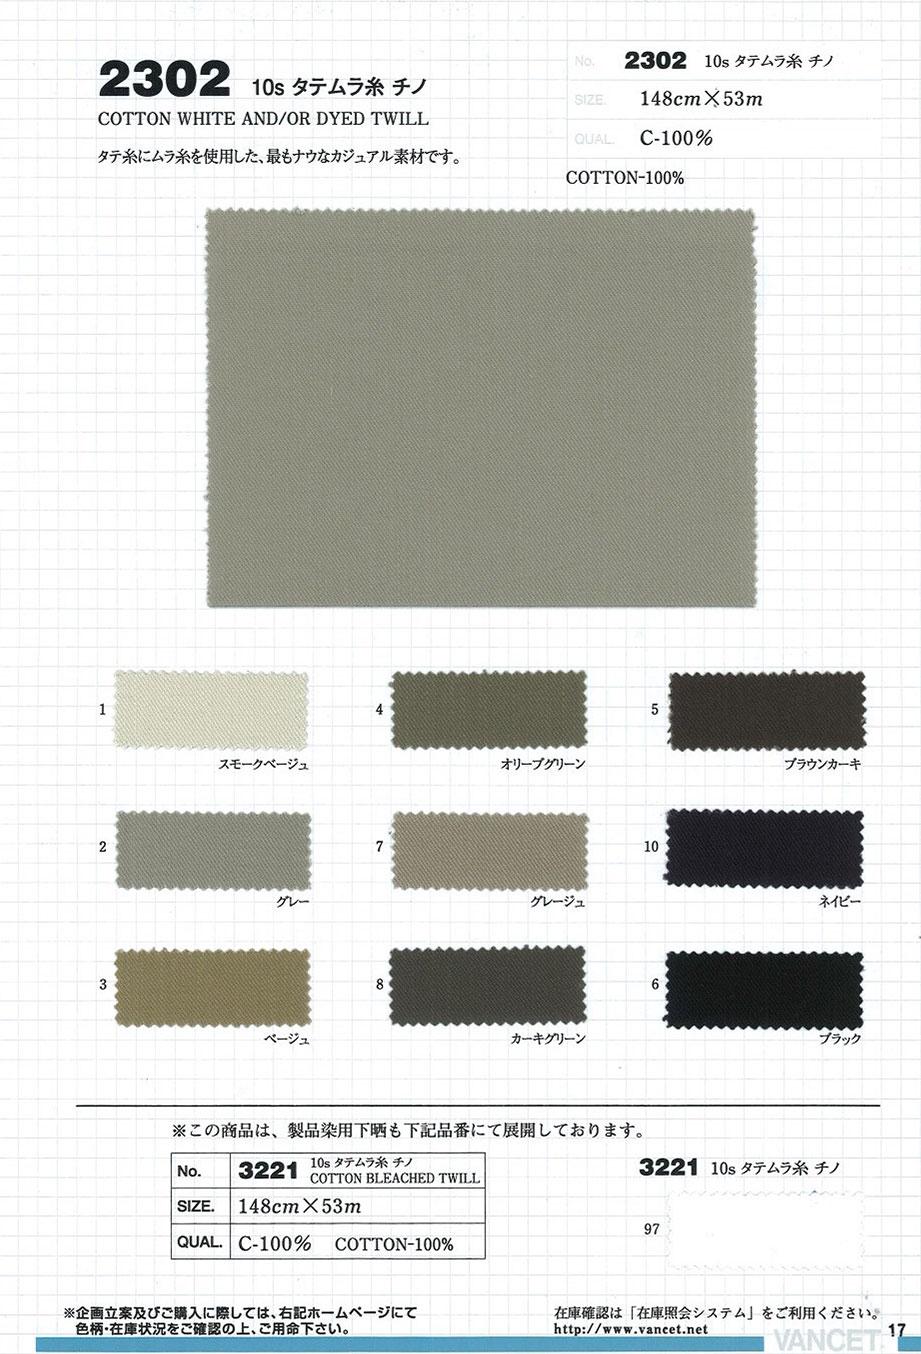 2302 10s タテムラ糸 チノ[生地] VANCET/オークラ商事 - ApparelX アパレル資材卸通販